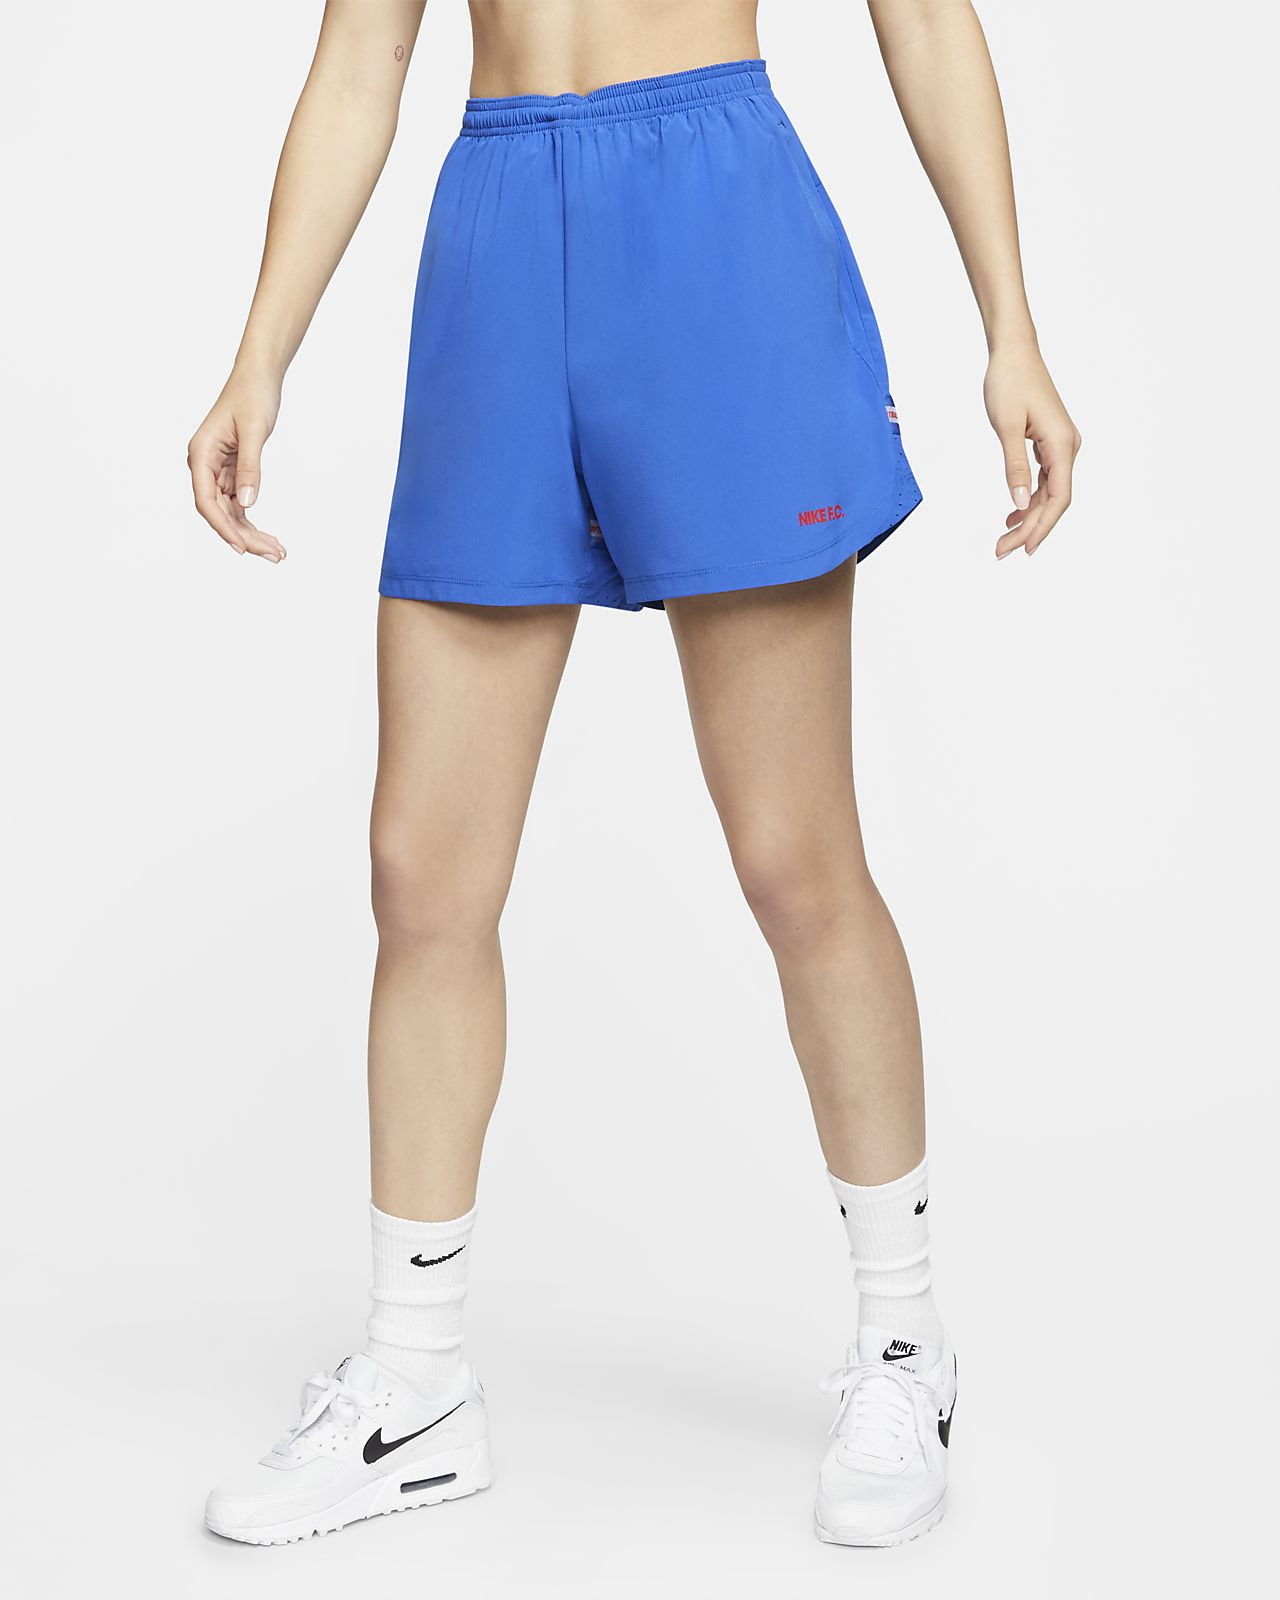 Nike F.C. Damen-Fußballshorts